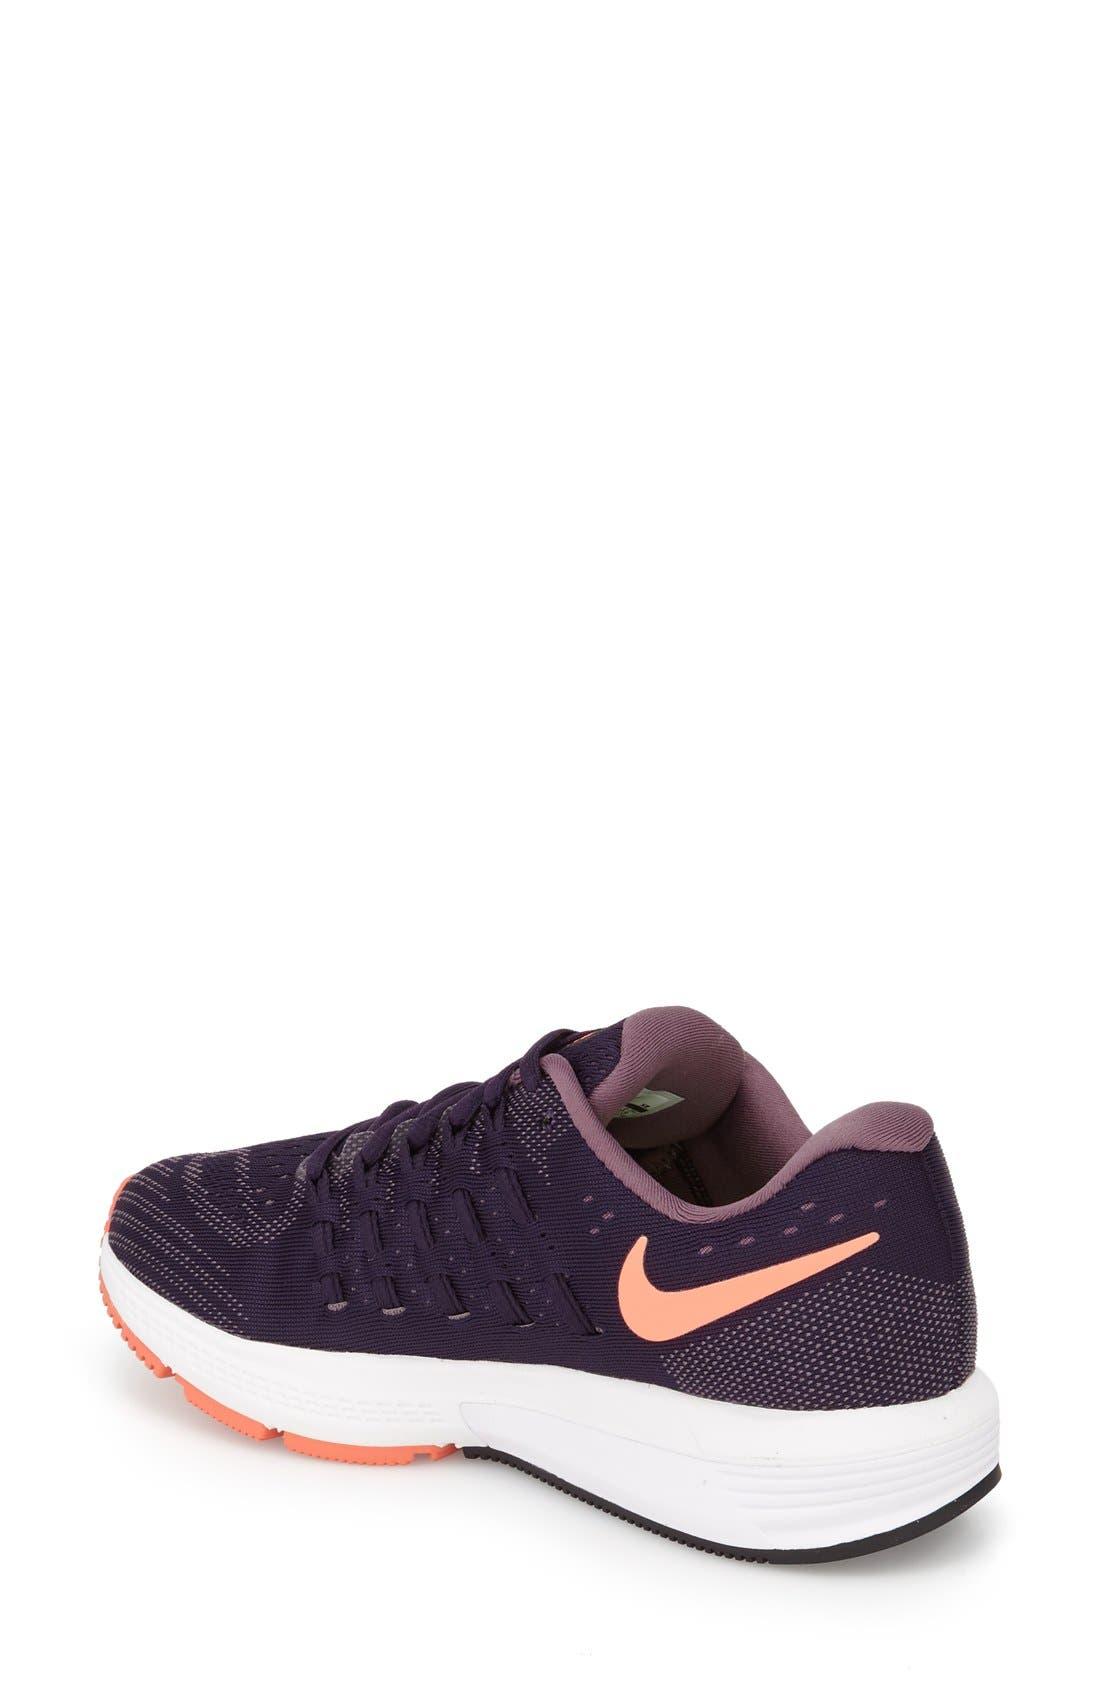 Alternate Image 2  - Nike Air Zoom Vomero 11 Sneaker (Women)